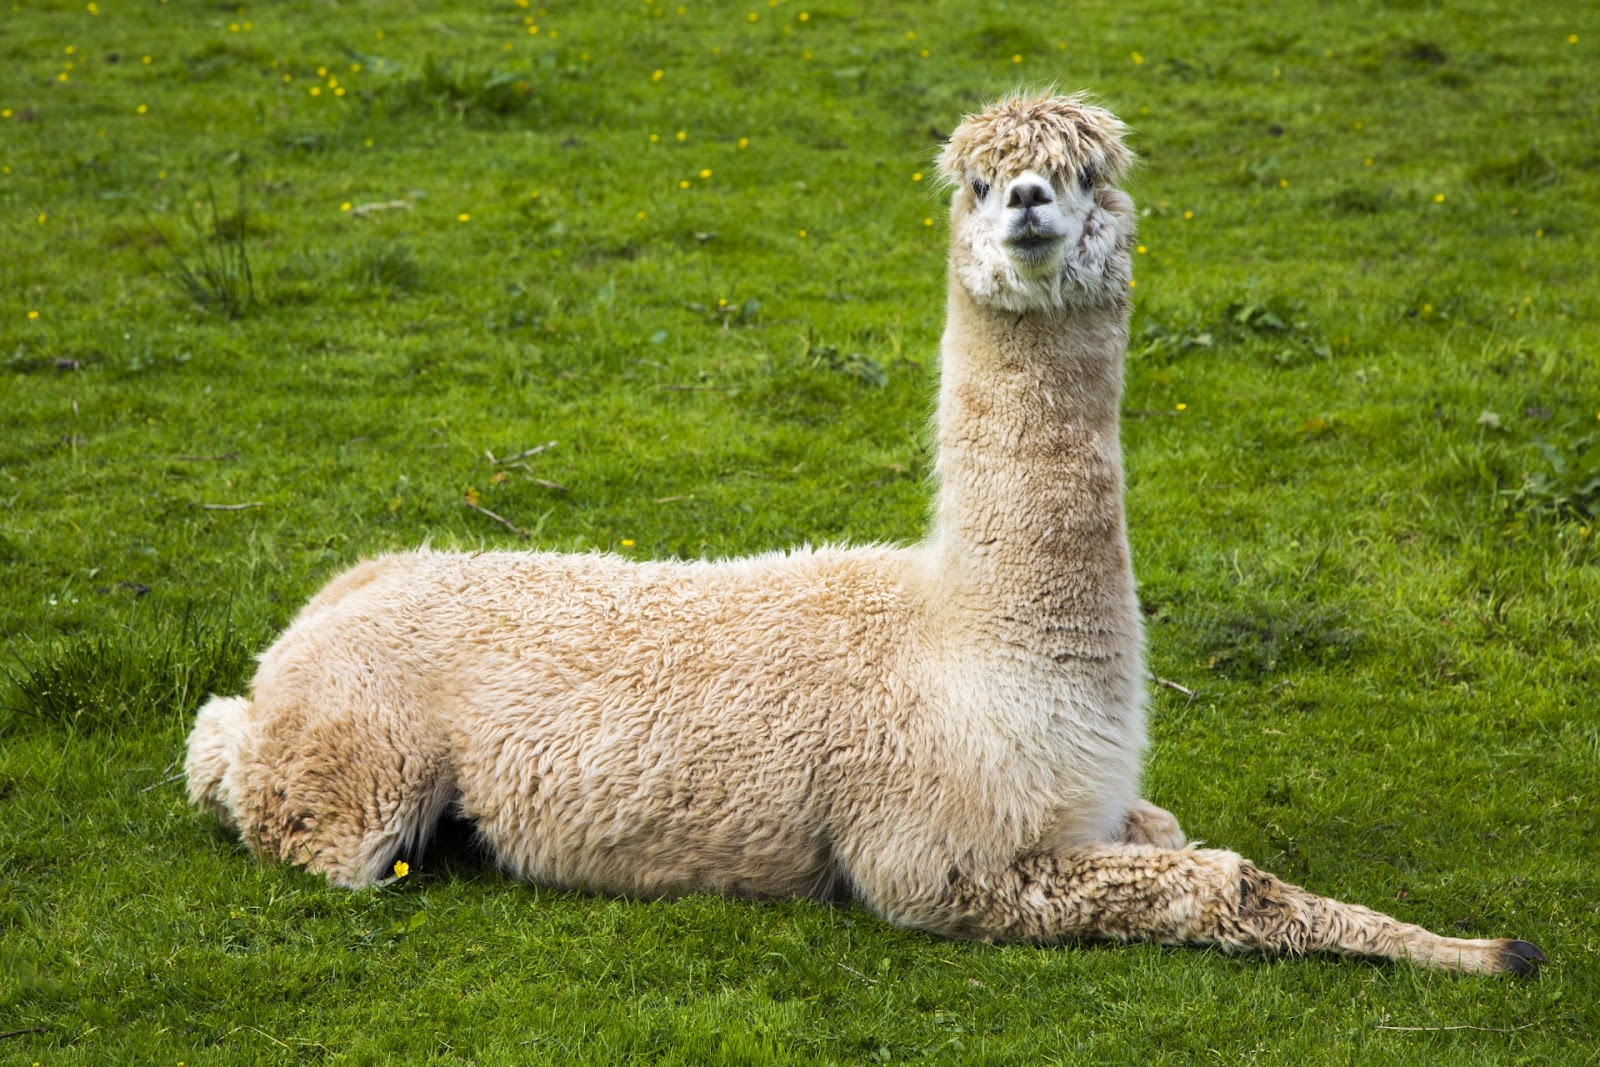 Llama Free Stock Photo - Public Domain Pictures